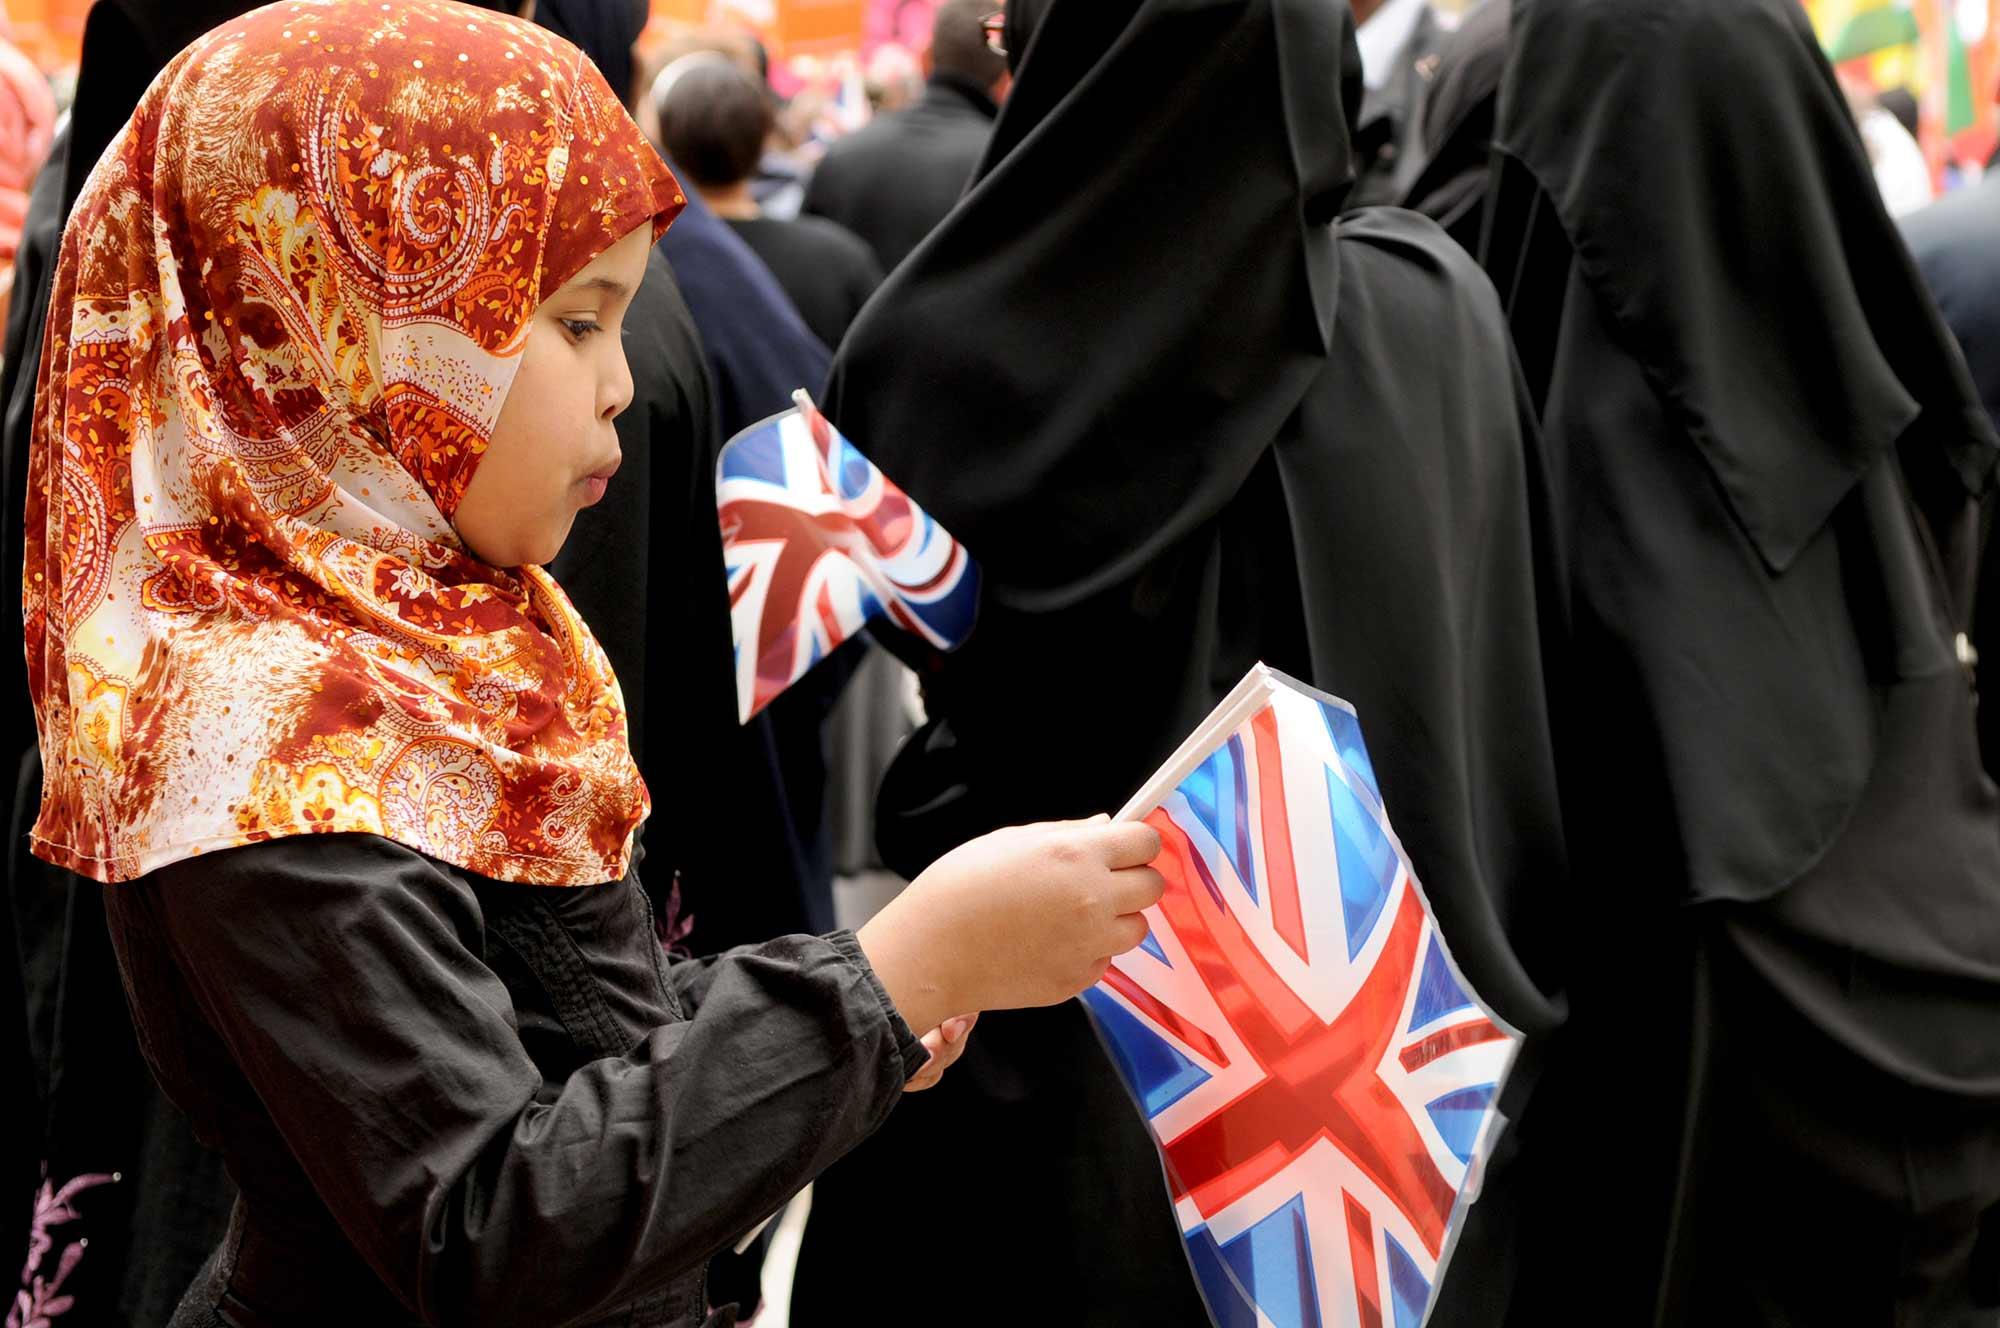 muslim randki uk za darmo oglądać ekstremalne randki online